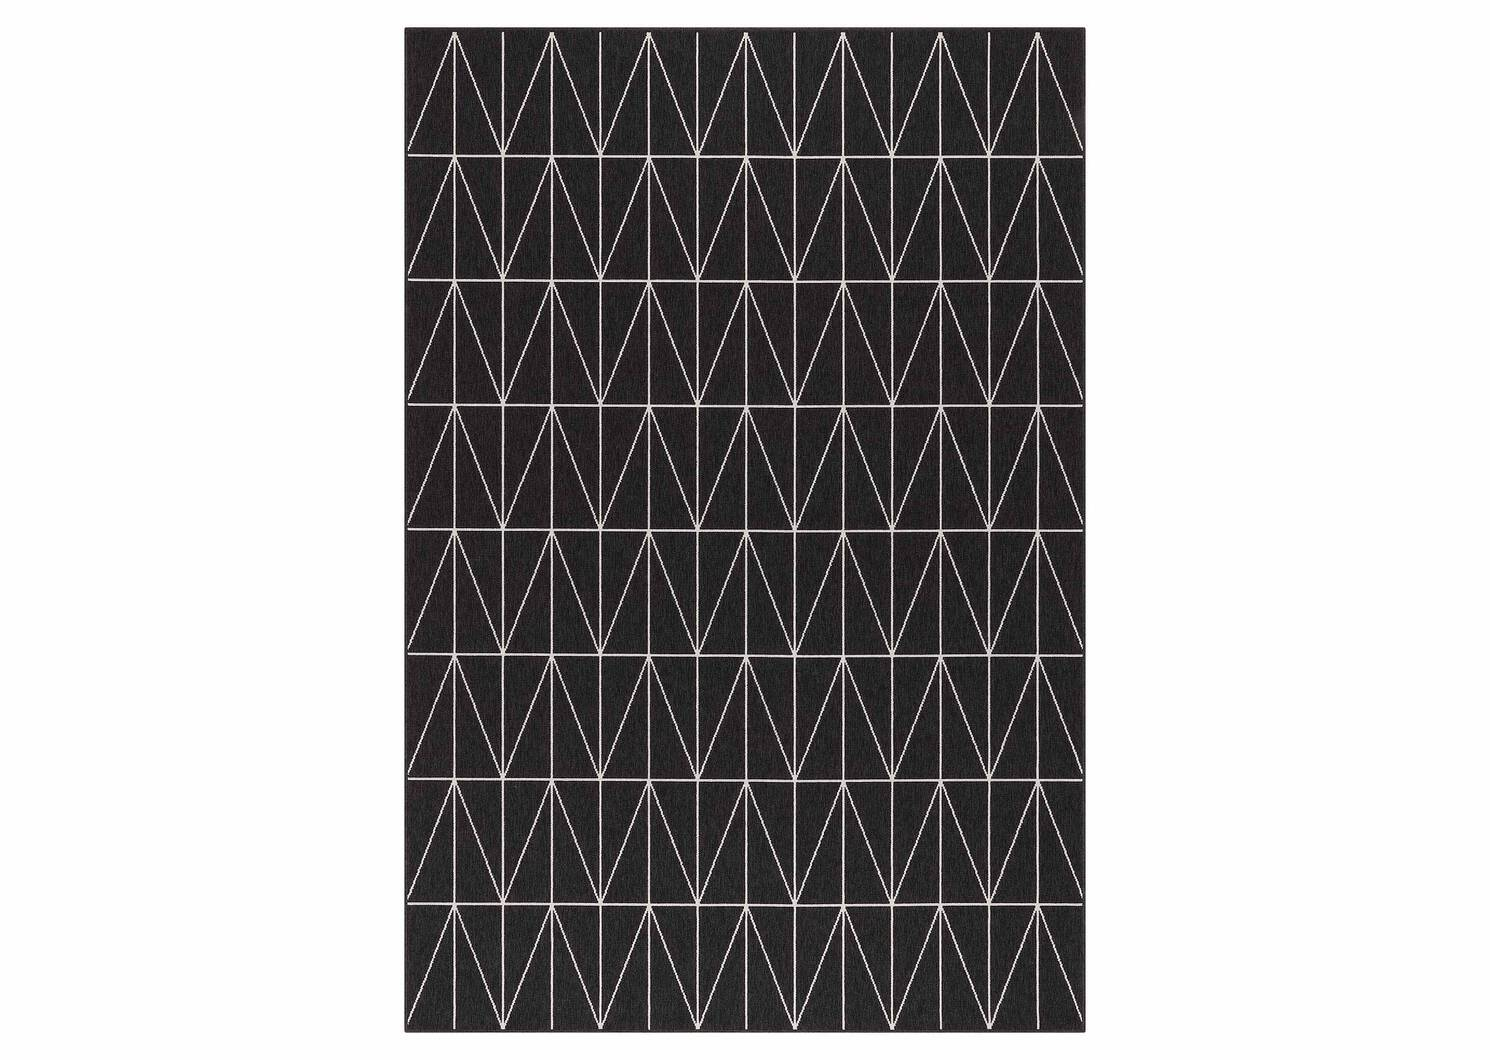 Matira Rug 79x114 Tile Black/Ivory